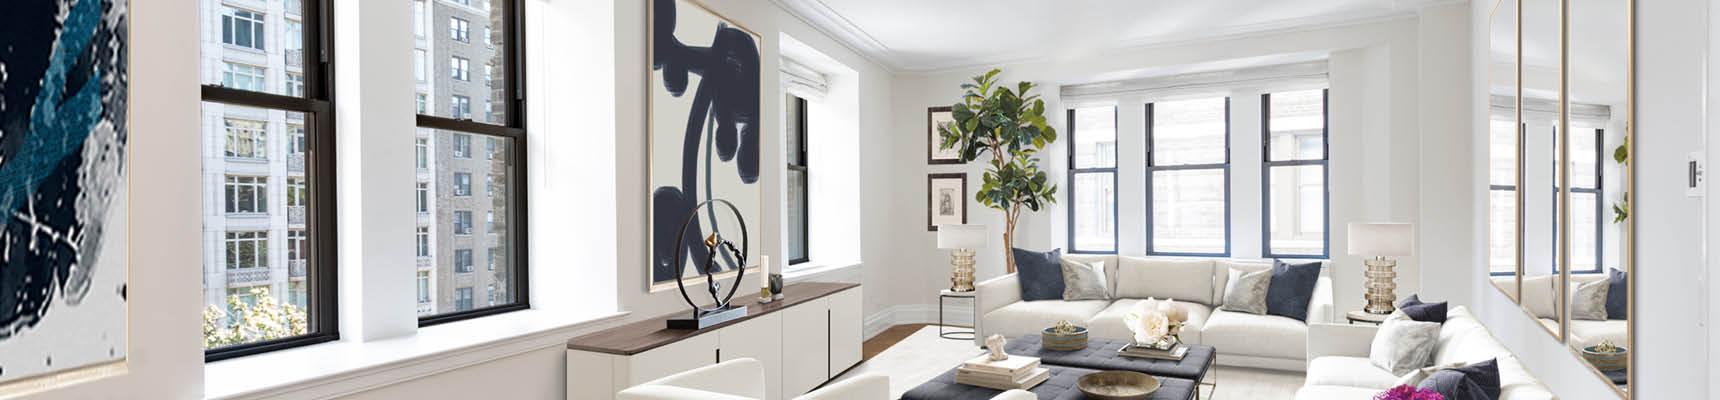 nyc real estate hamptons south florida homes the corcoran group